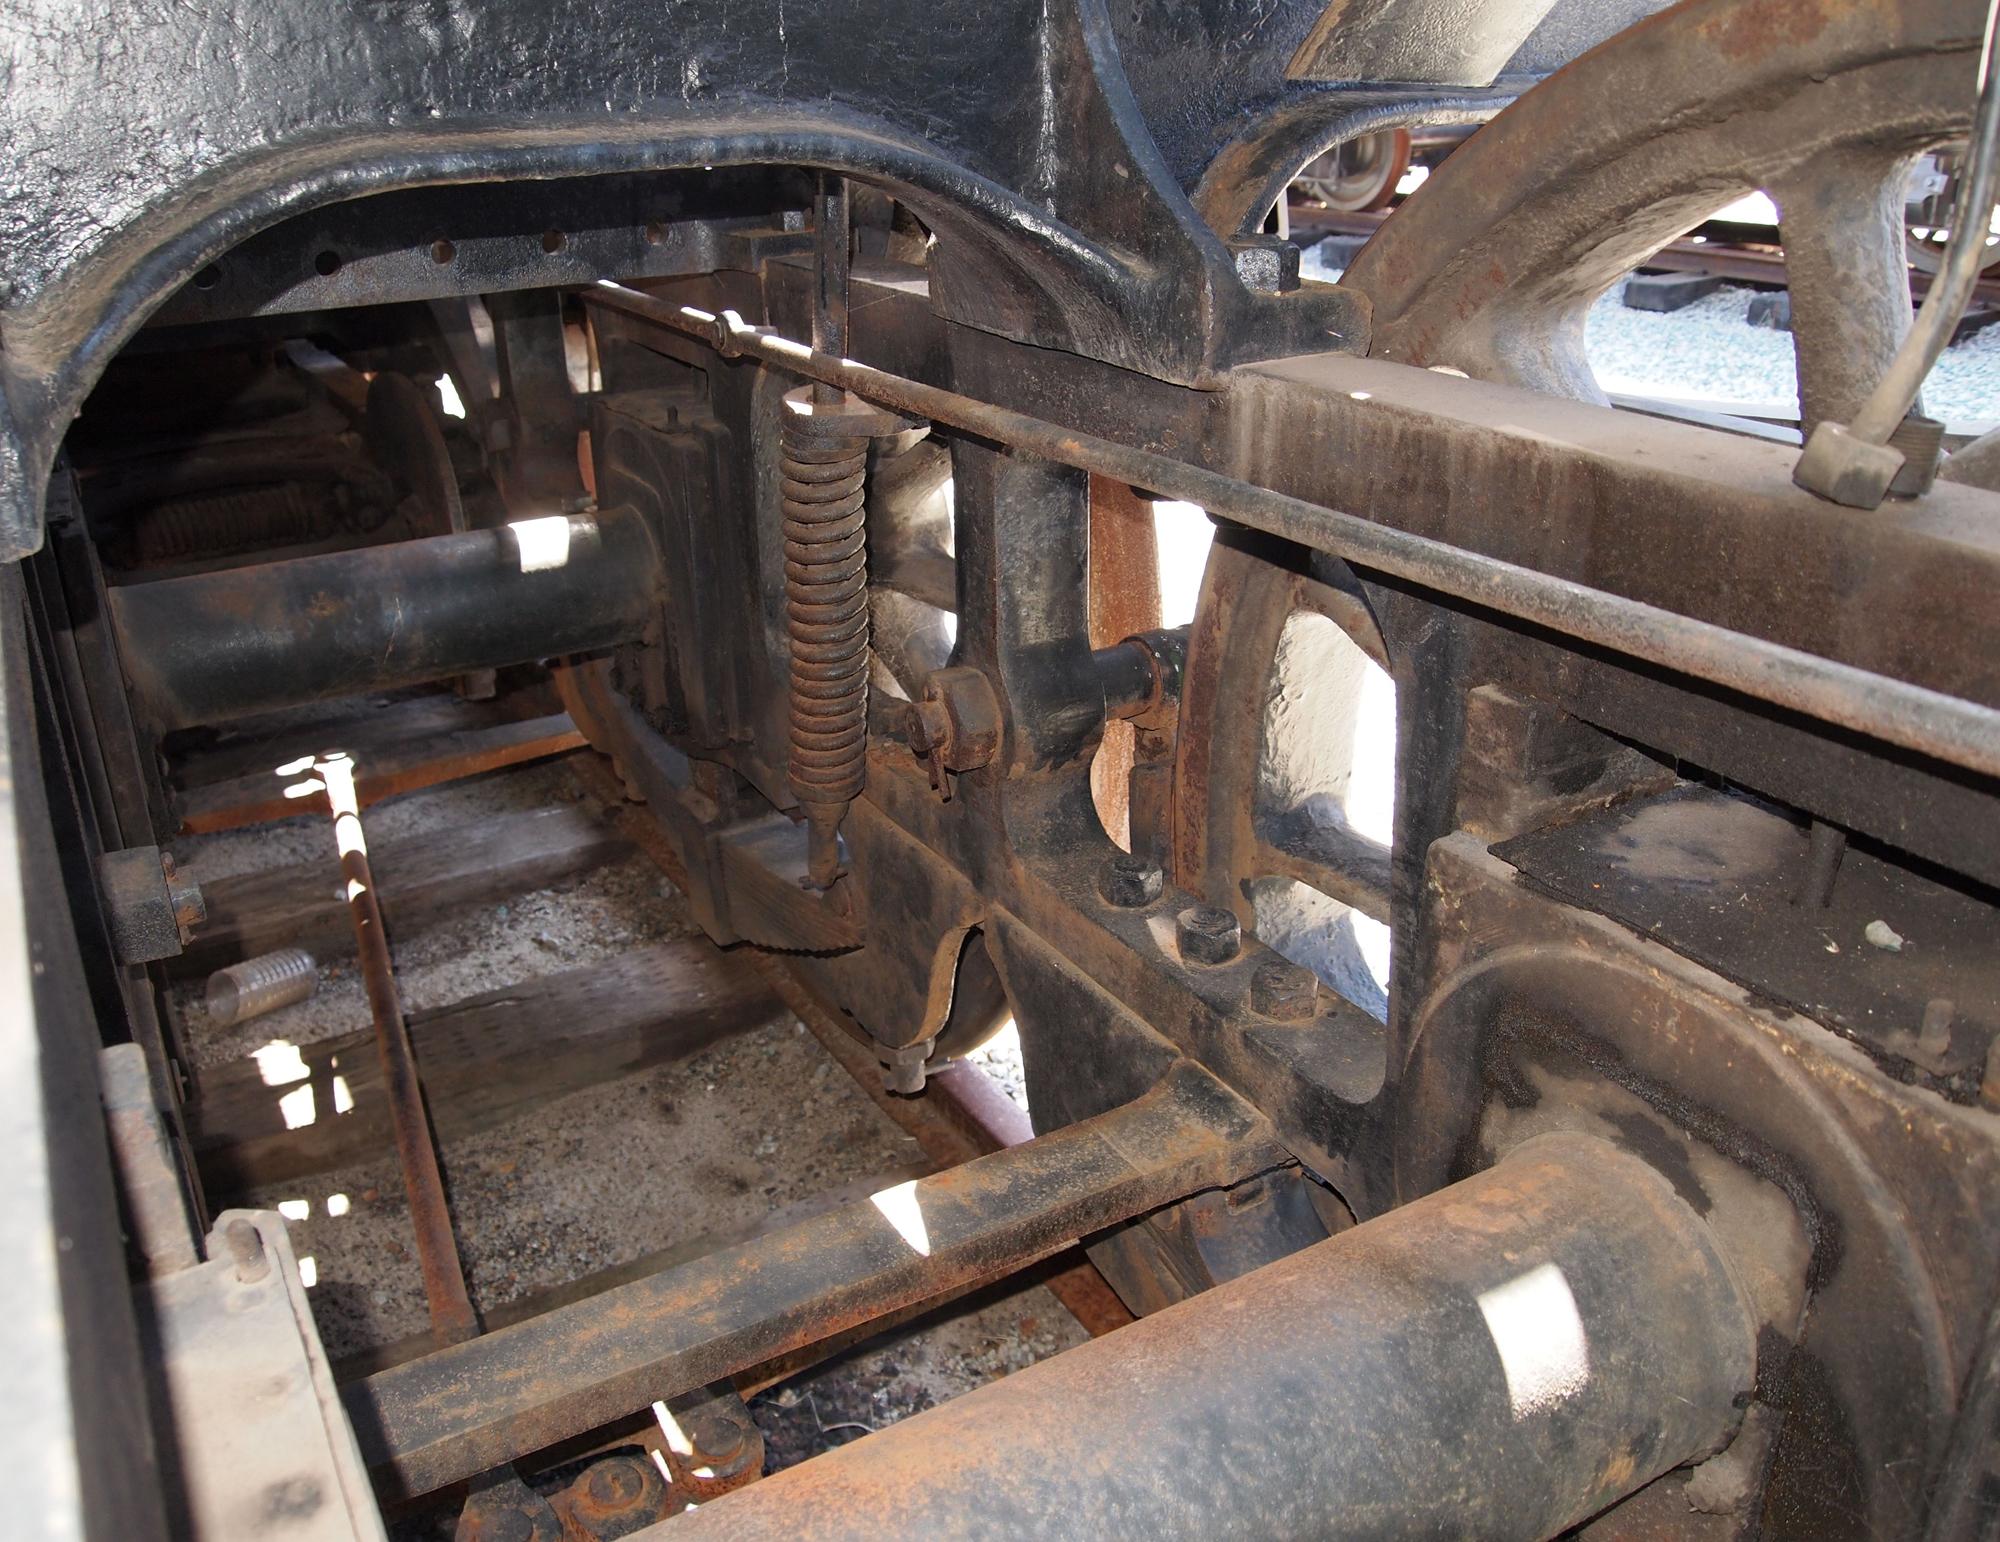 File:Bar frames U class locomotive WAGR.jpg - Wikimedia Commons